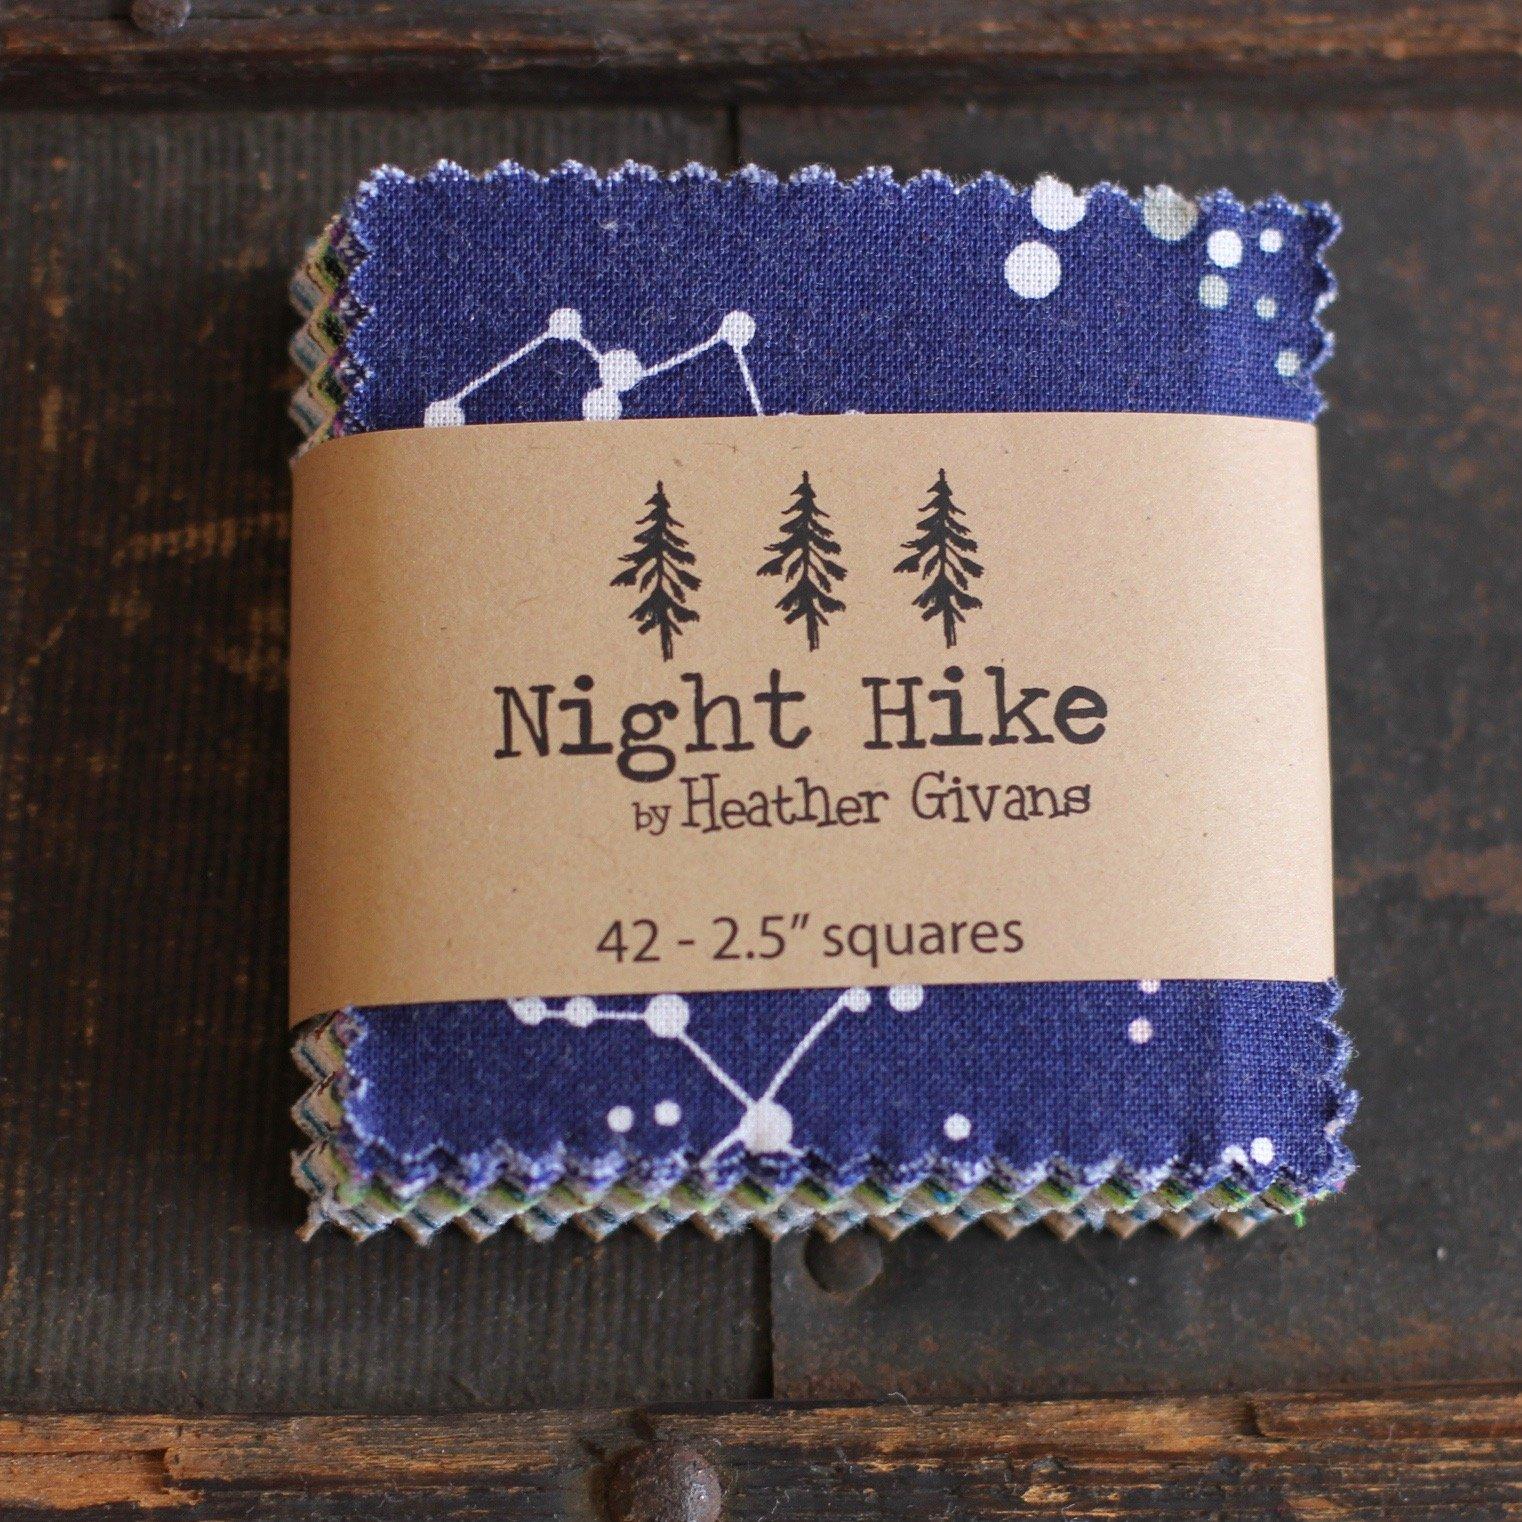 Night Hike Mini Charms - (42) 2.5 squares